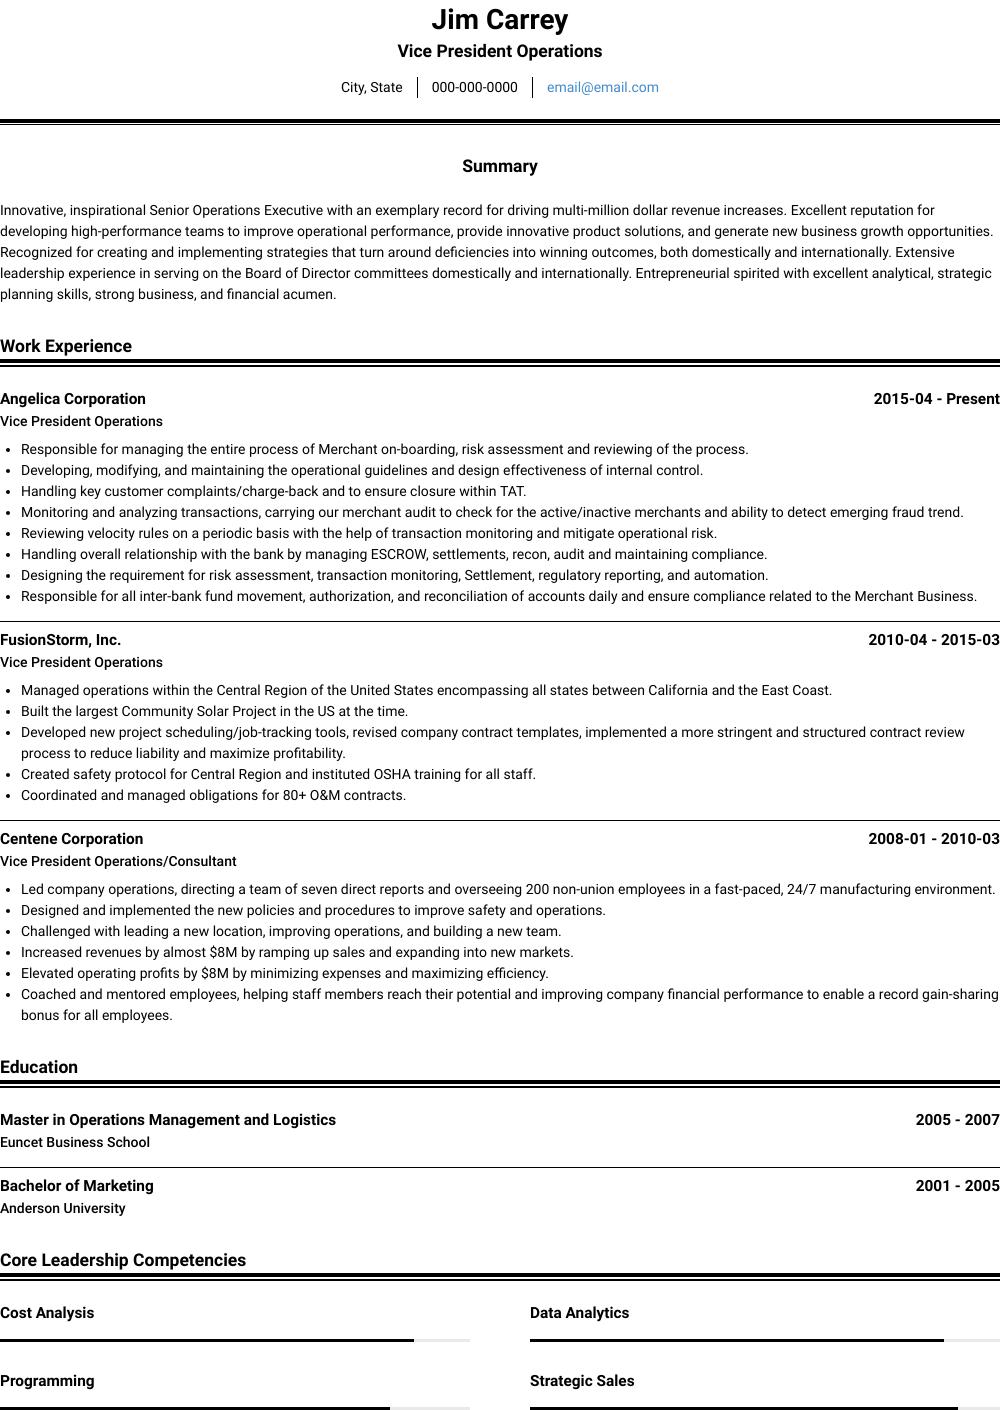 Vp Operations - Resume Samples & Templates   VisualCV